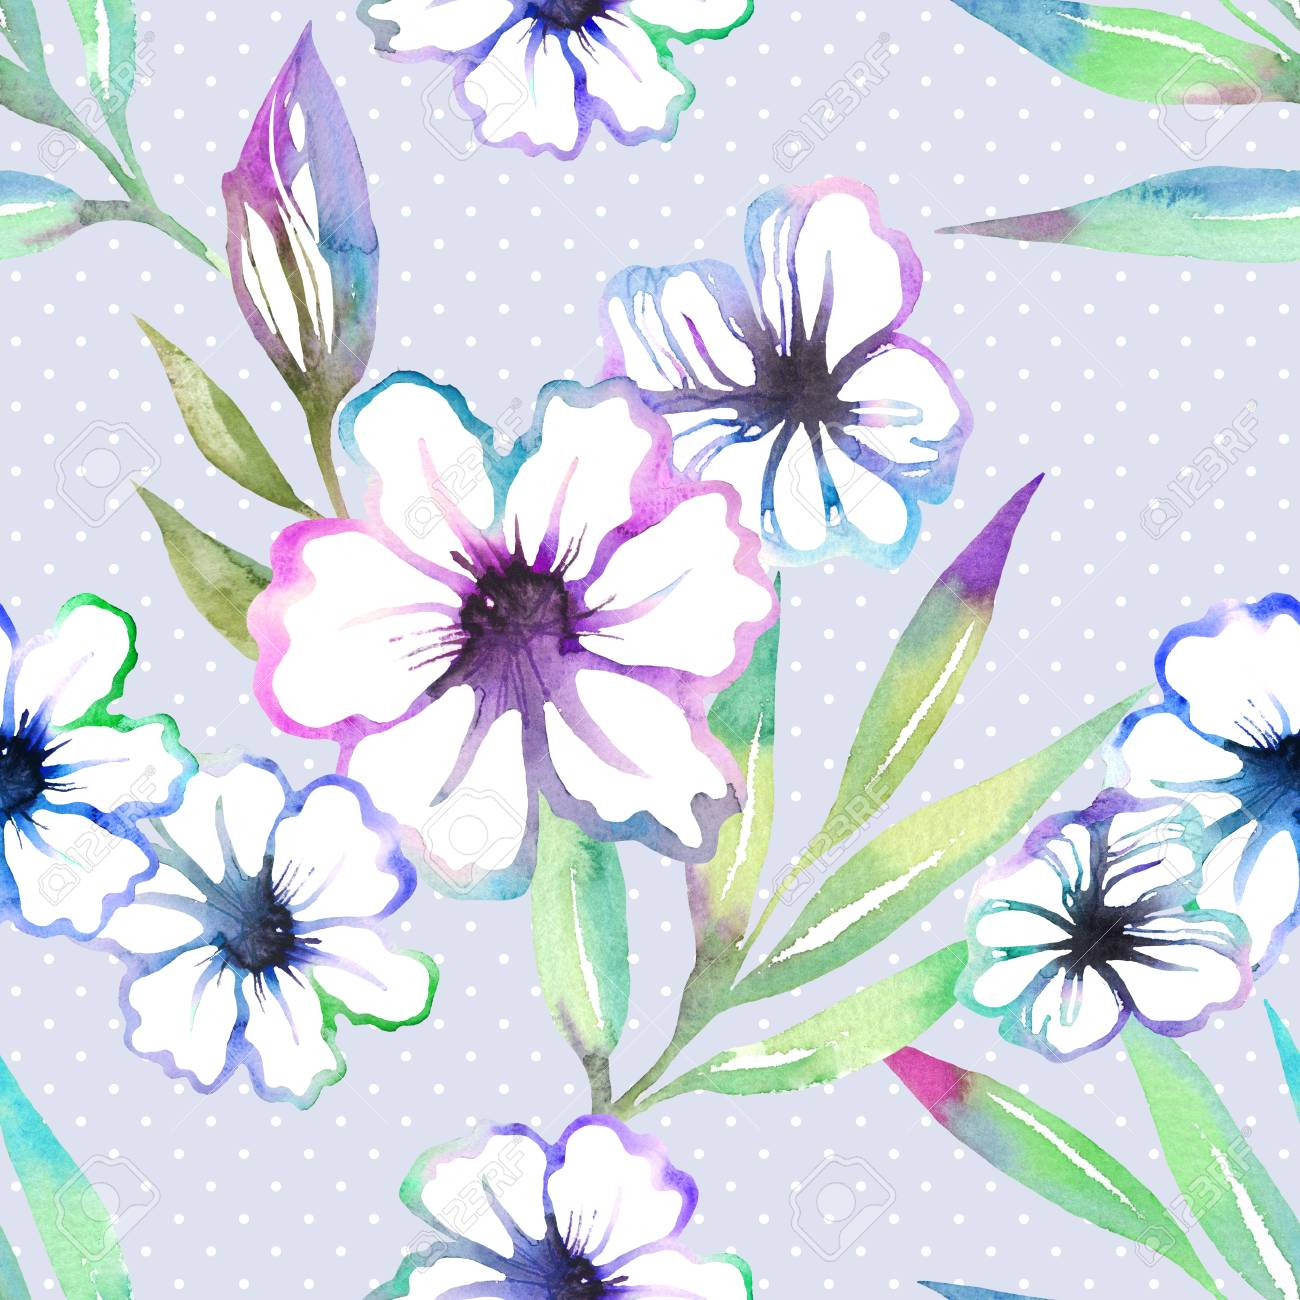 Nahtloses Mit Blumenmuster Mit Nettem Sommer Blüht Aquarell Süße